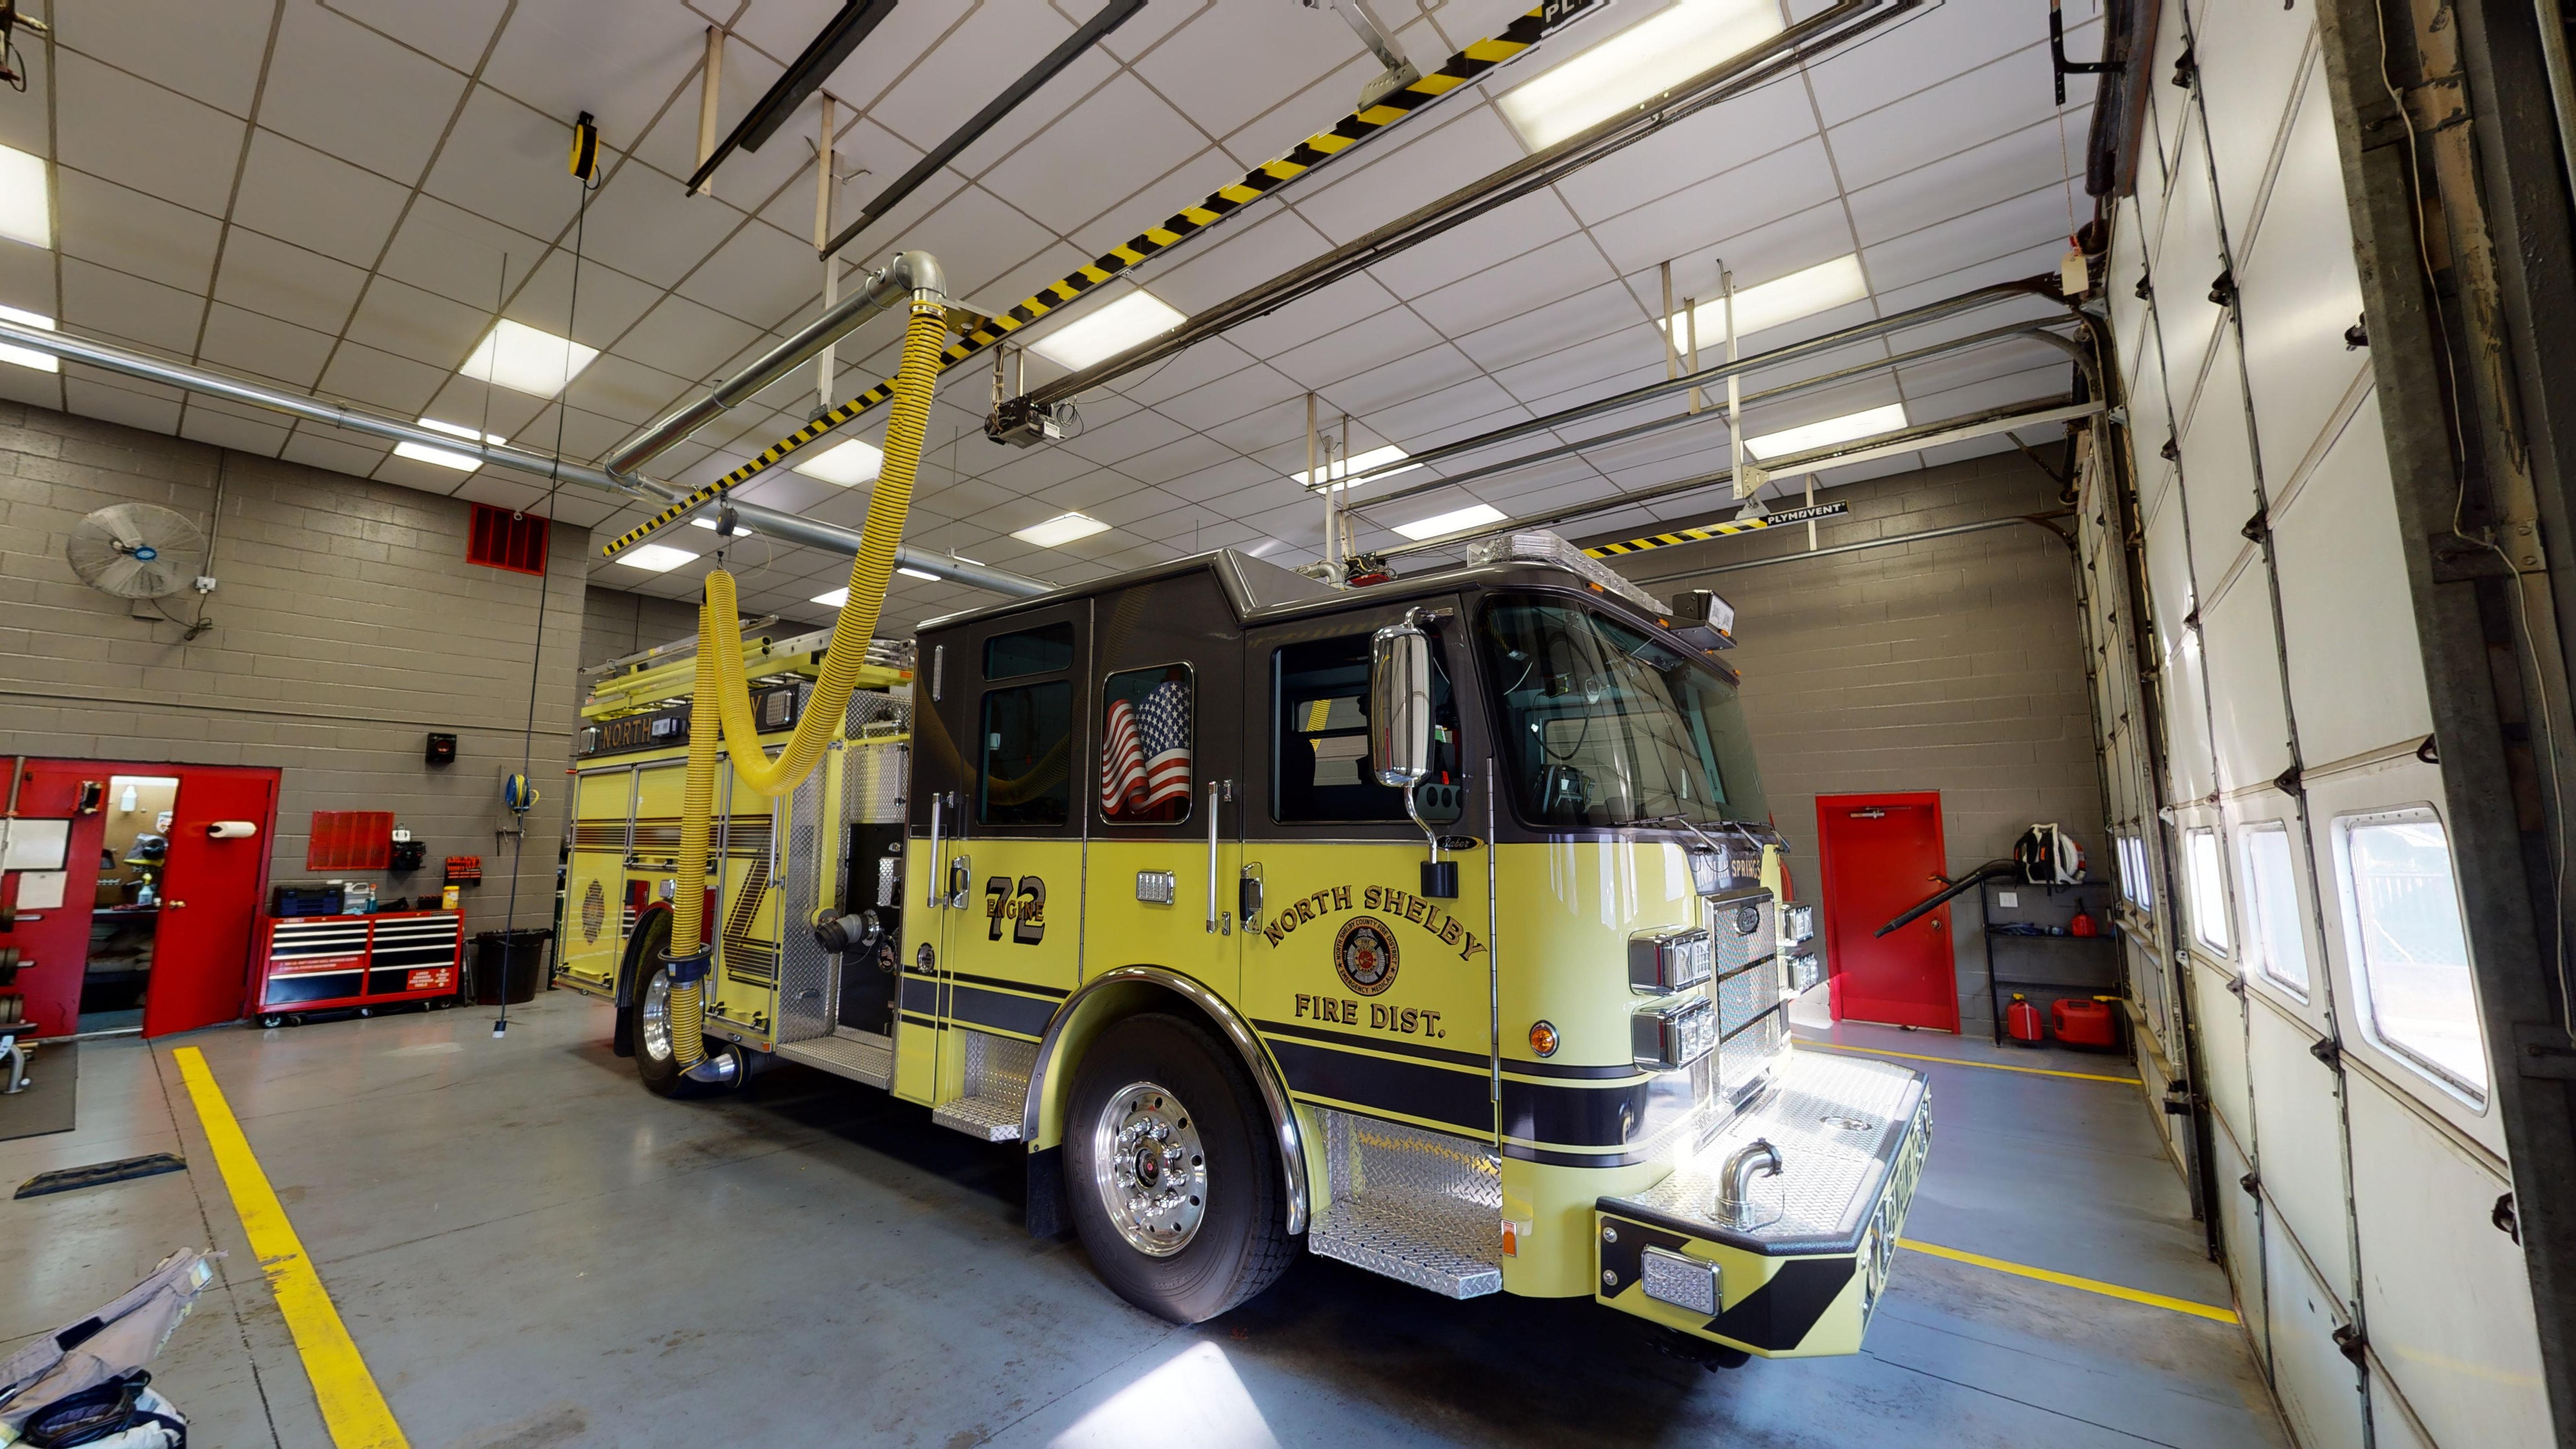 North-Shelby-Fire-District-Saber-custom-pumper-06182021_100014